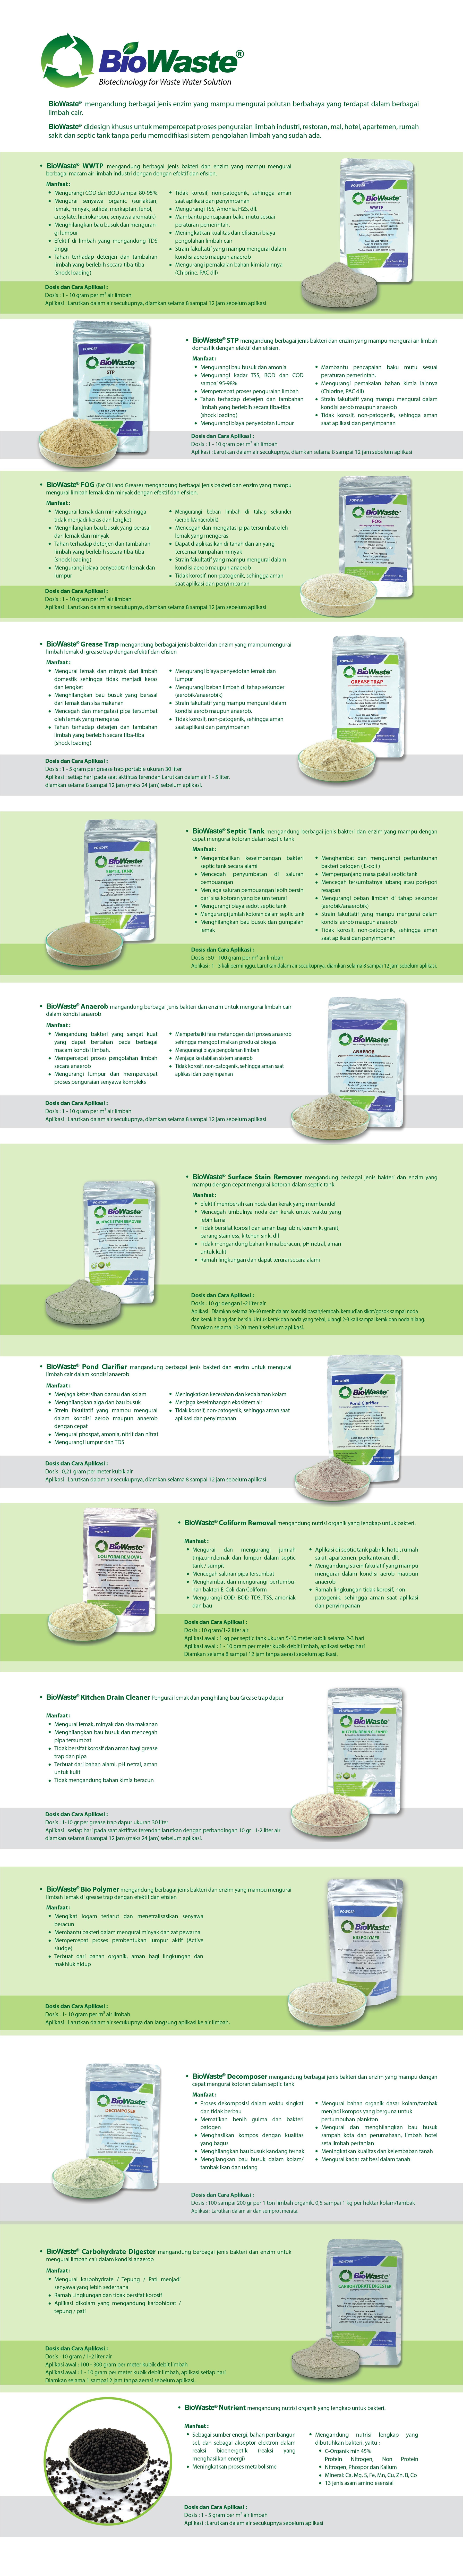 Biowaste-Product-05